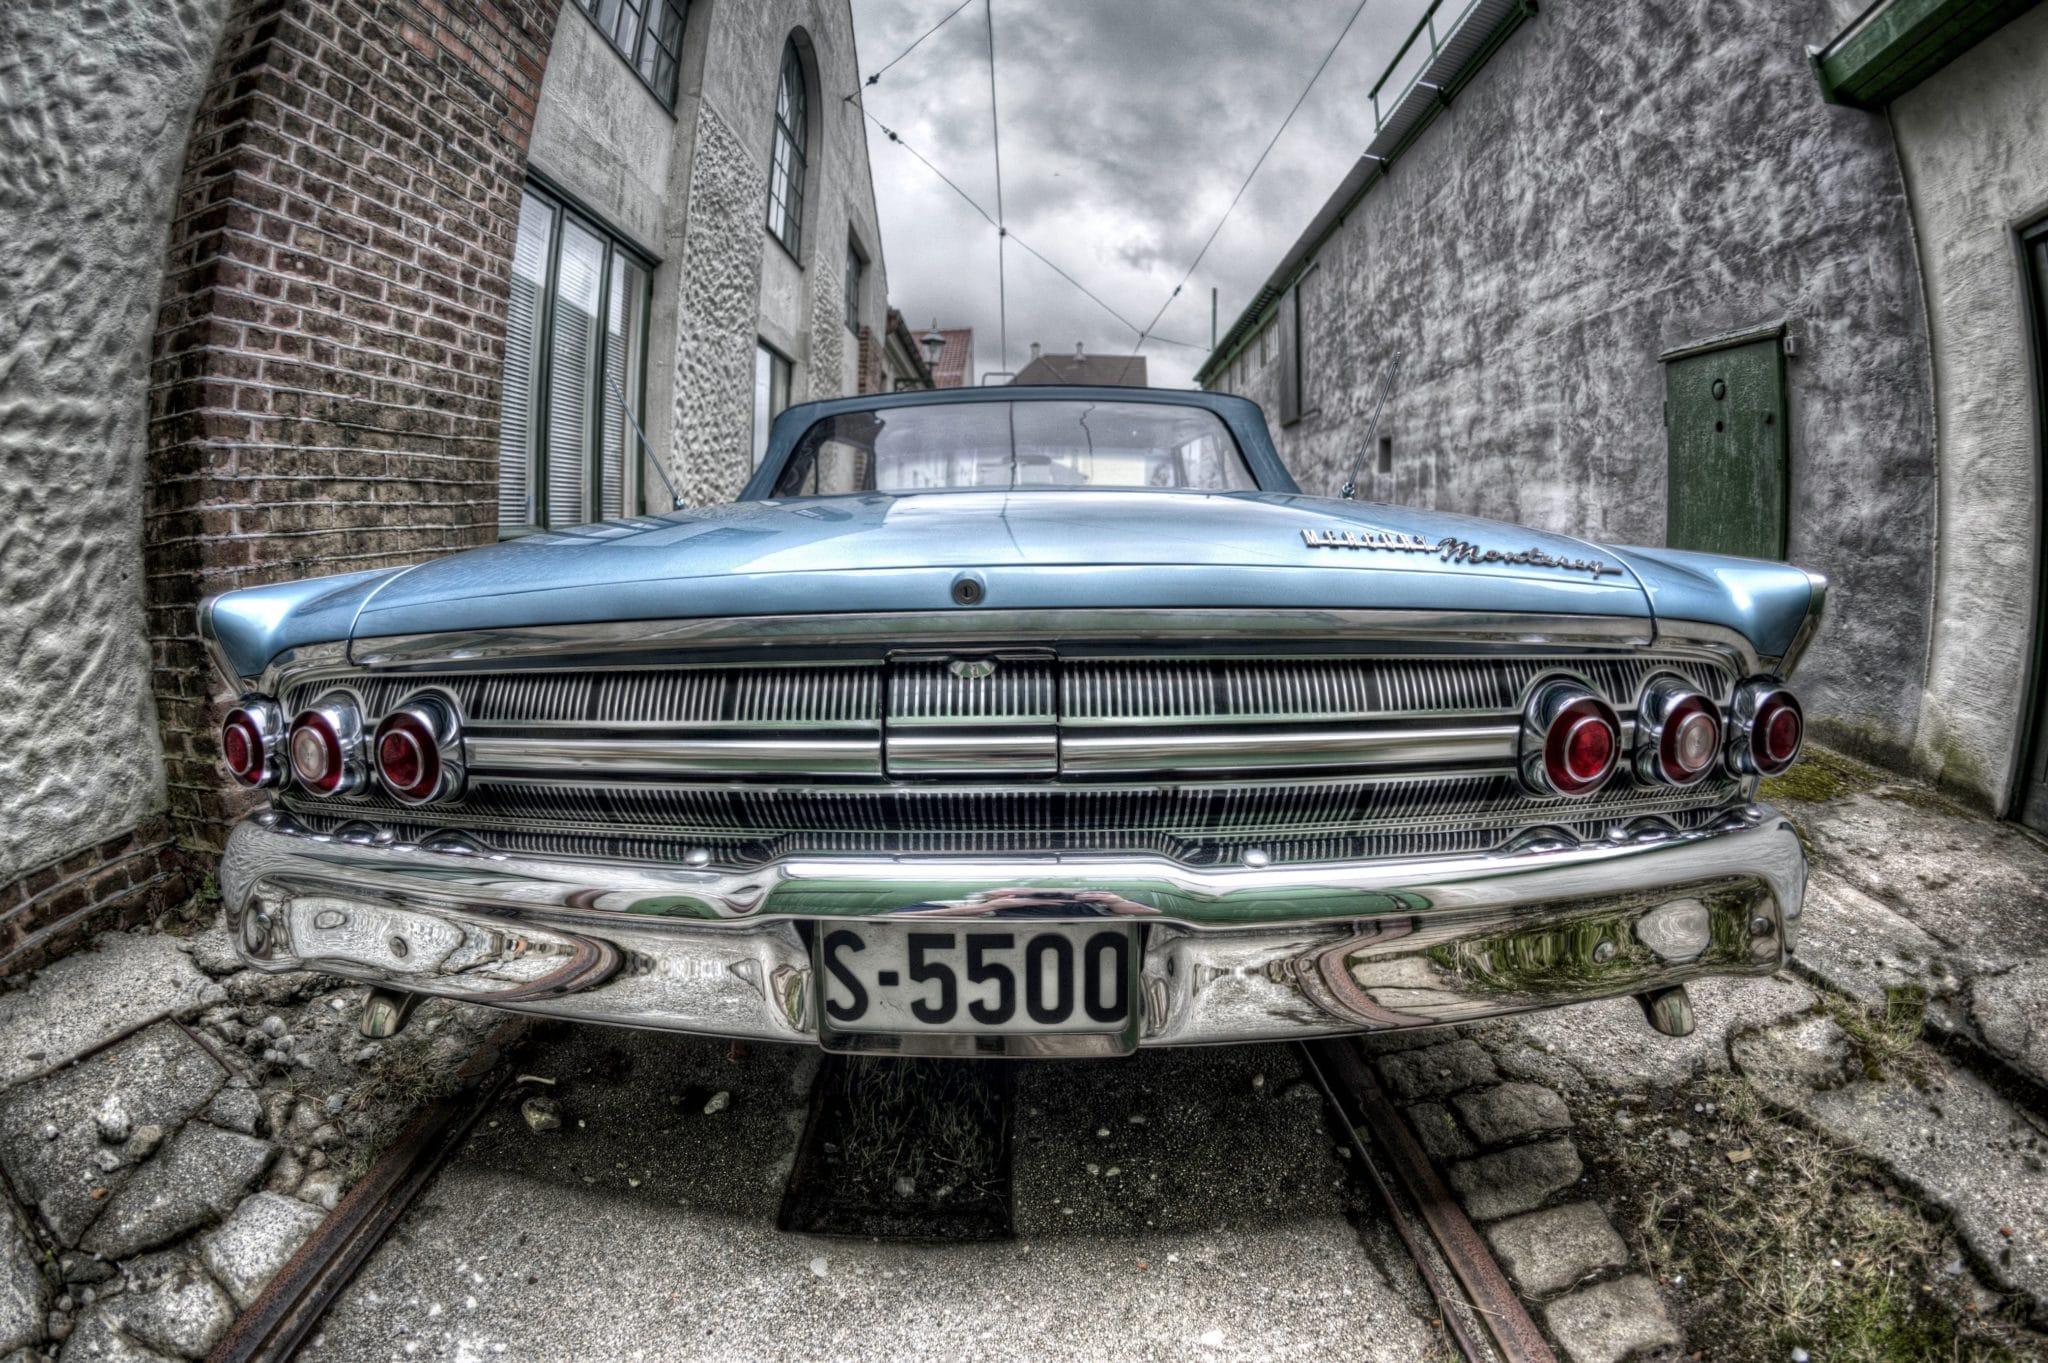 Gamle amerikanske biler til salg